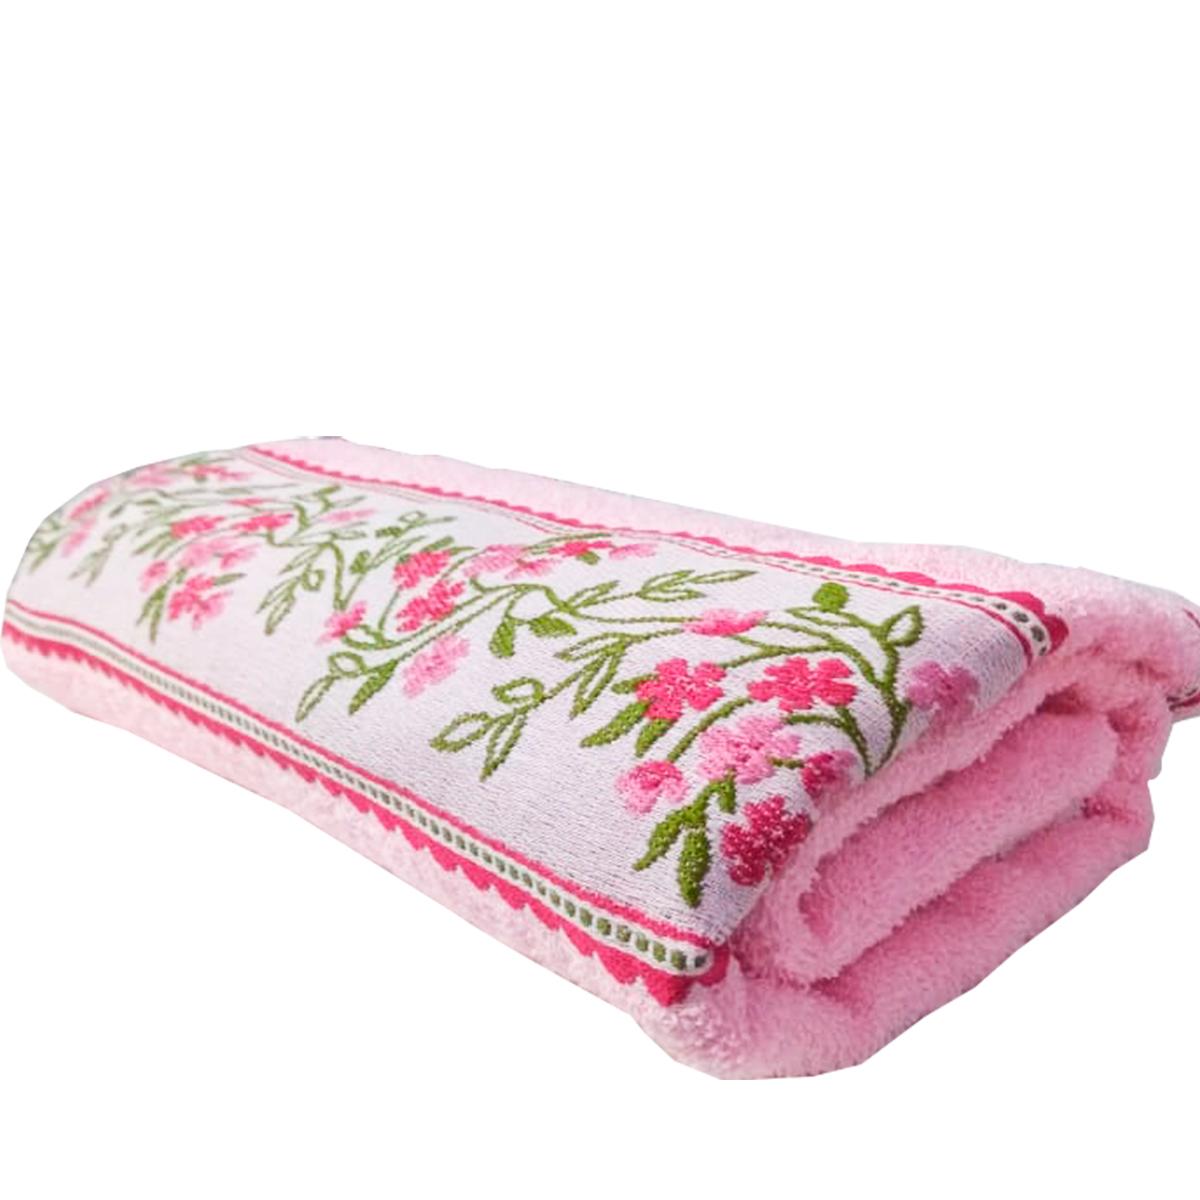 Toalha de Banho Candy Rosa Pet Lufamar